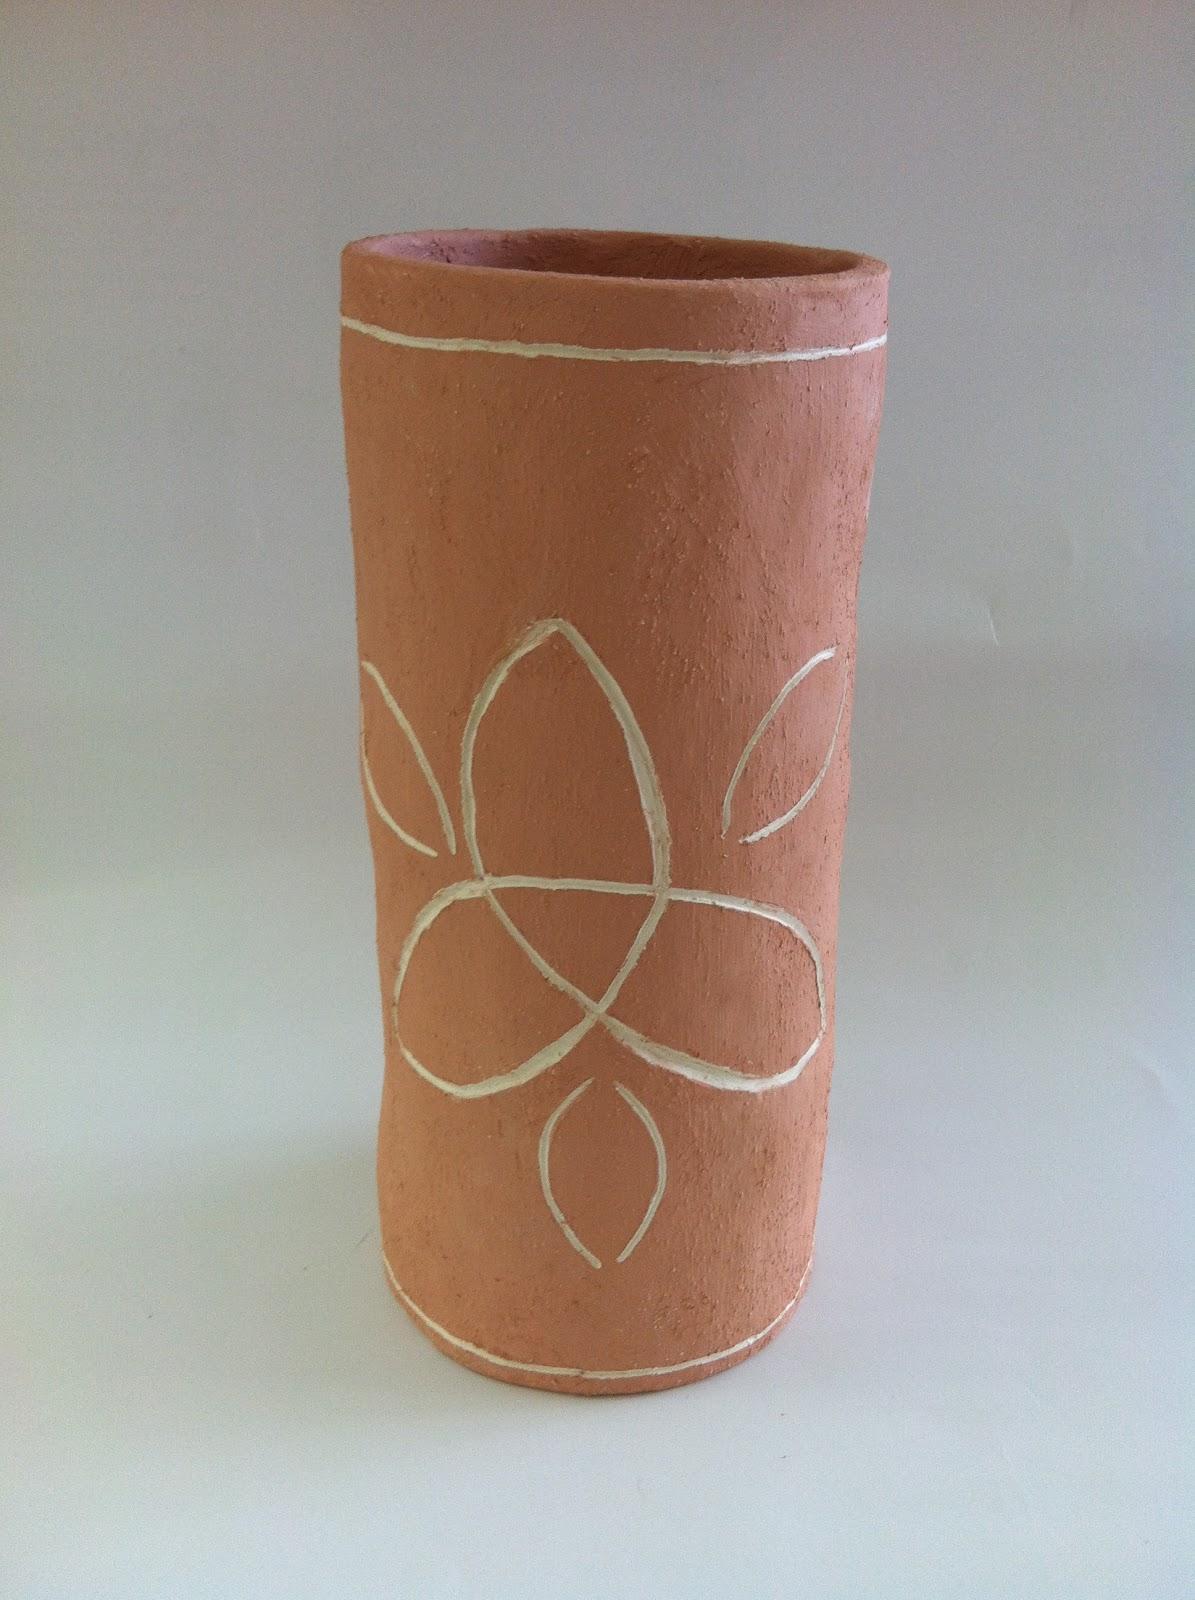 Bhs art gallery ceramics coil pots